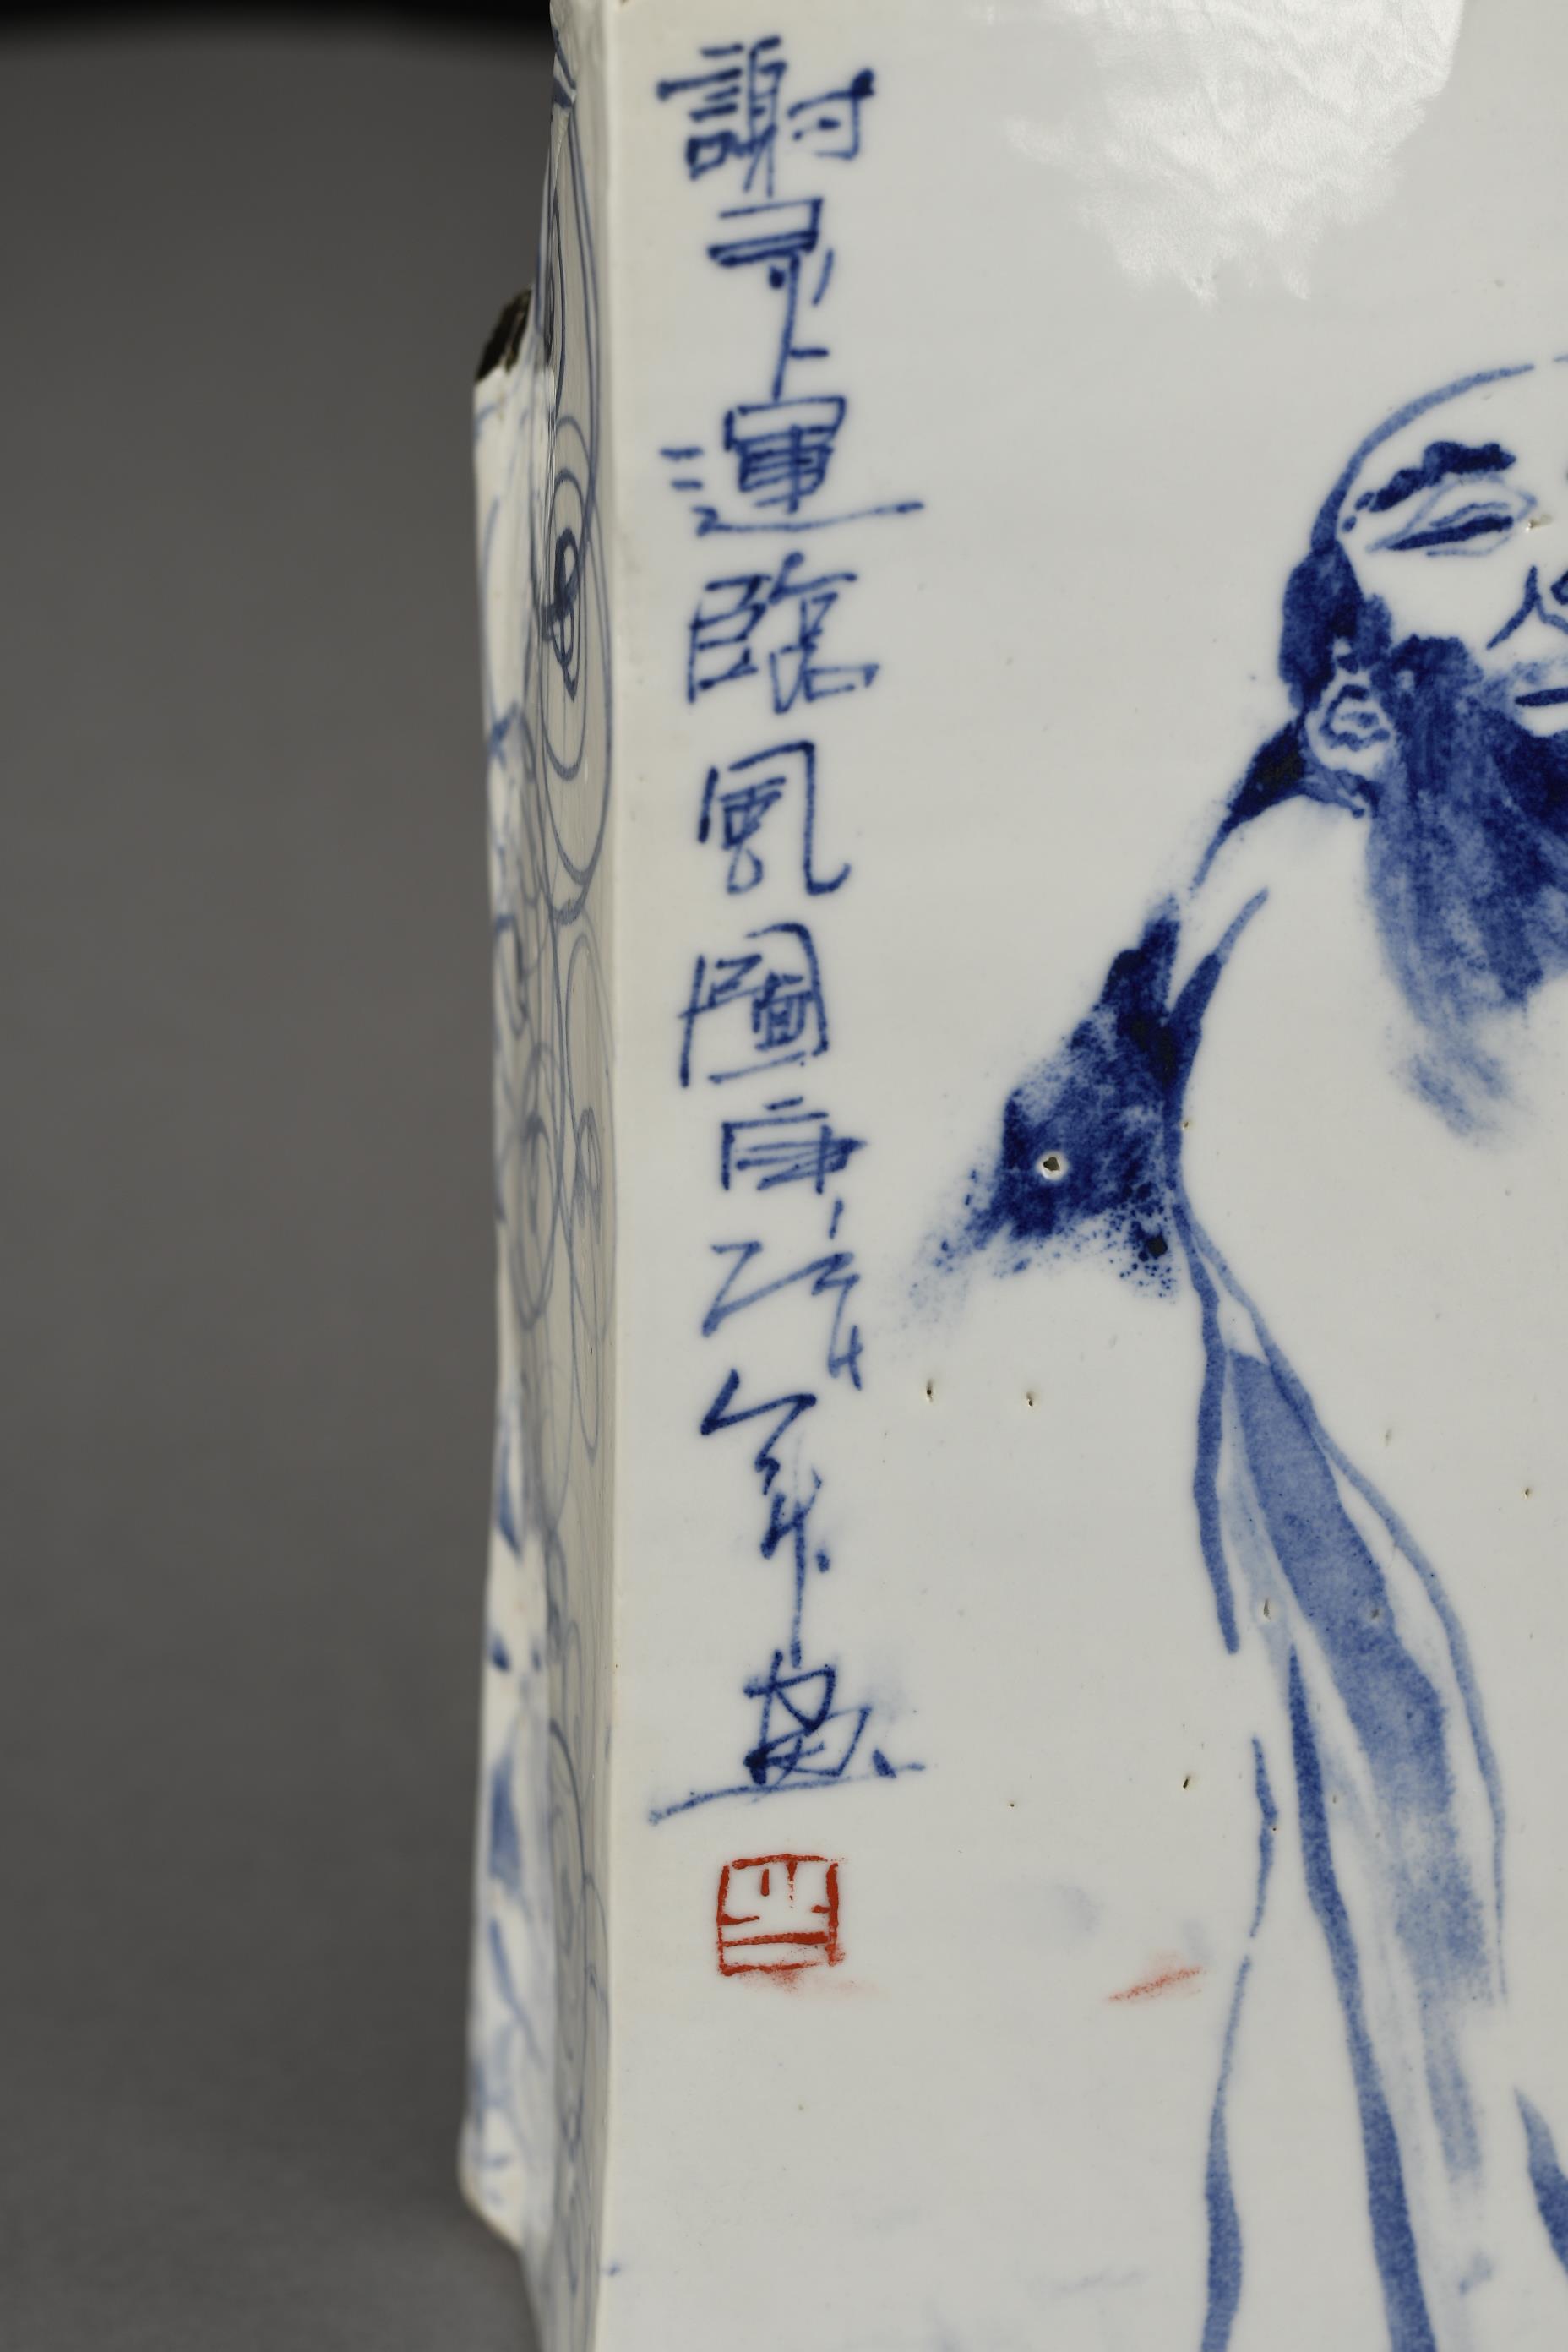 Original Hand Painted Shiwan Porcelain Art Vase. - Image 9 of 12